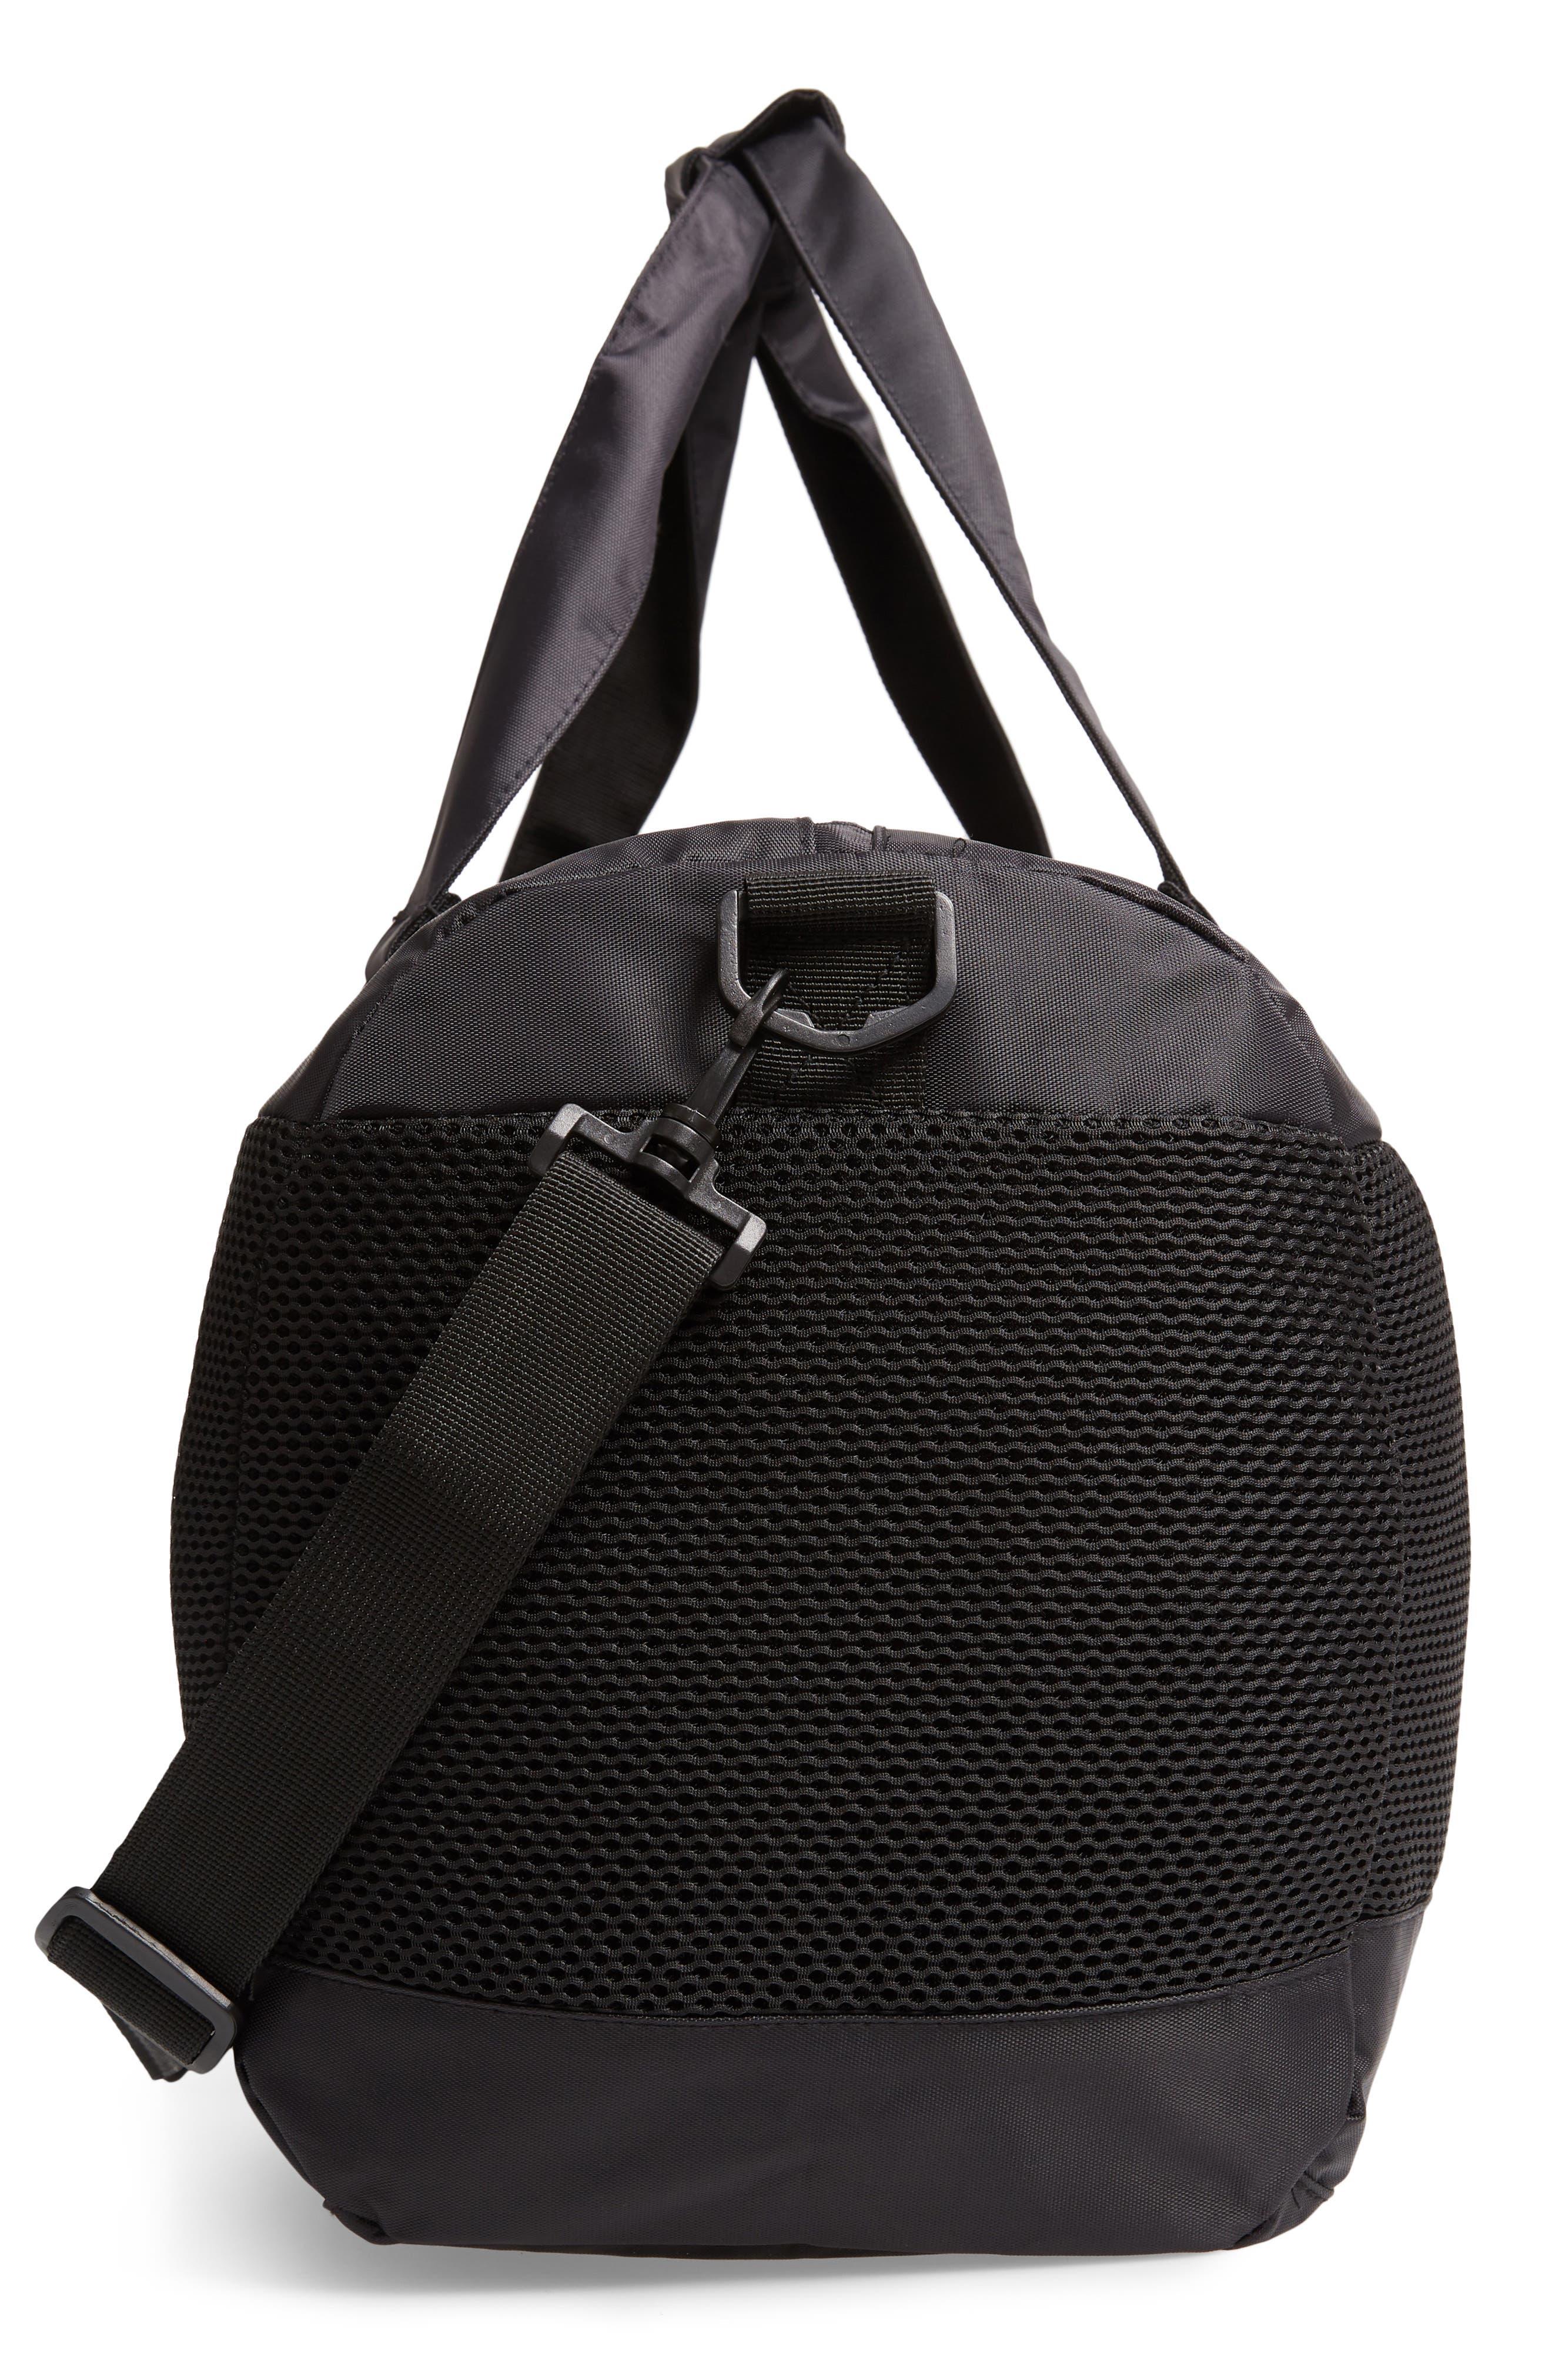 XL Athletic Duffel Bag,                             Alternate thumbnail 5, color,                             BLACK-WHITE